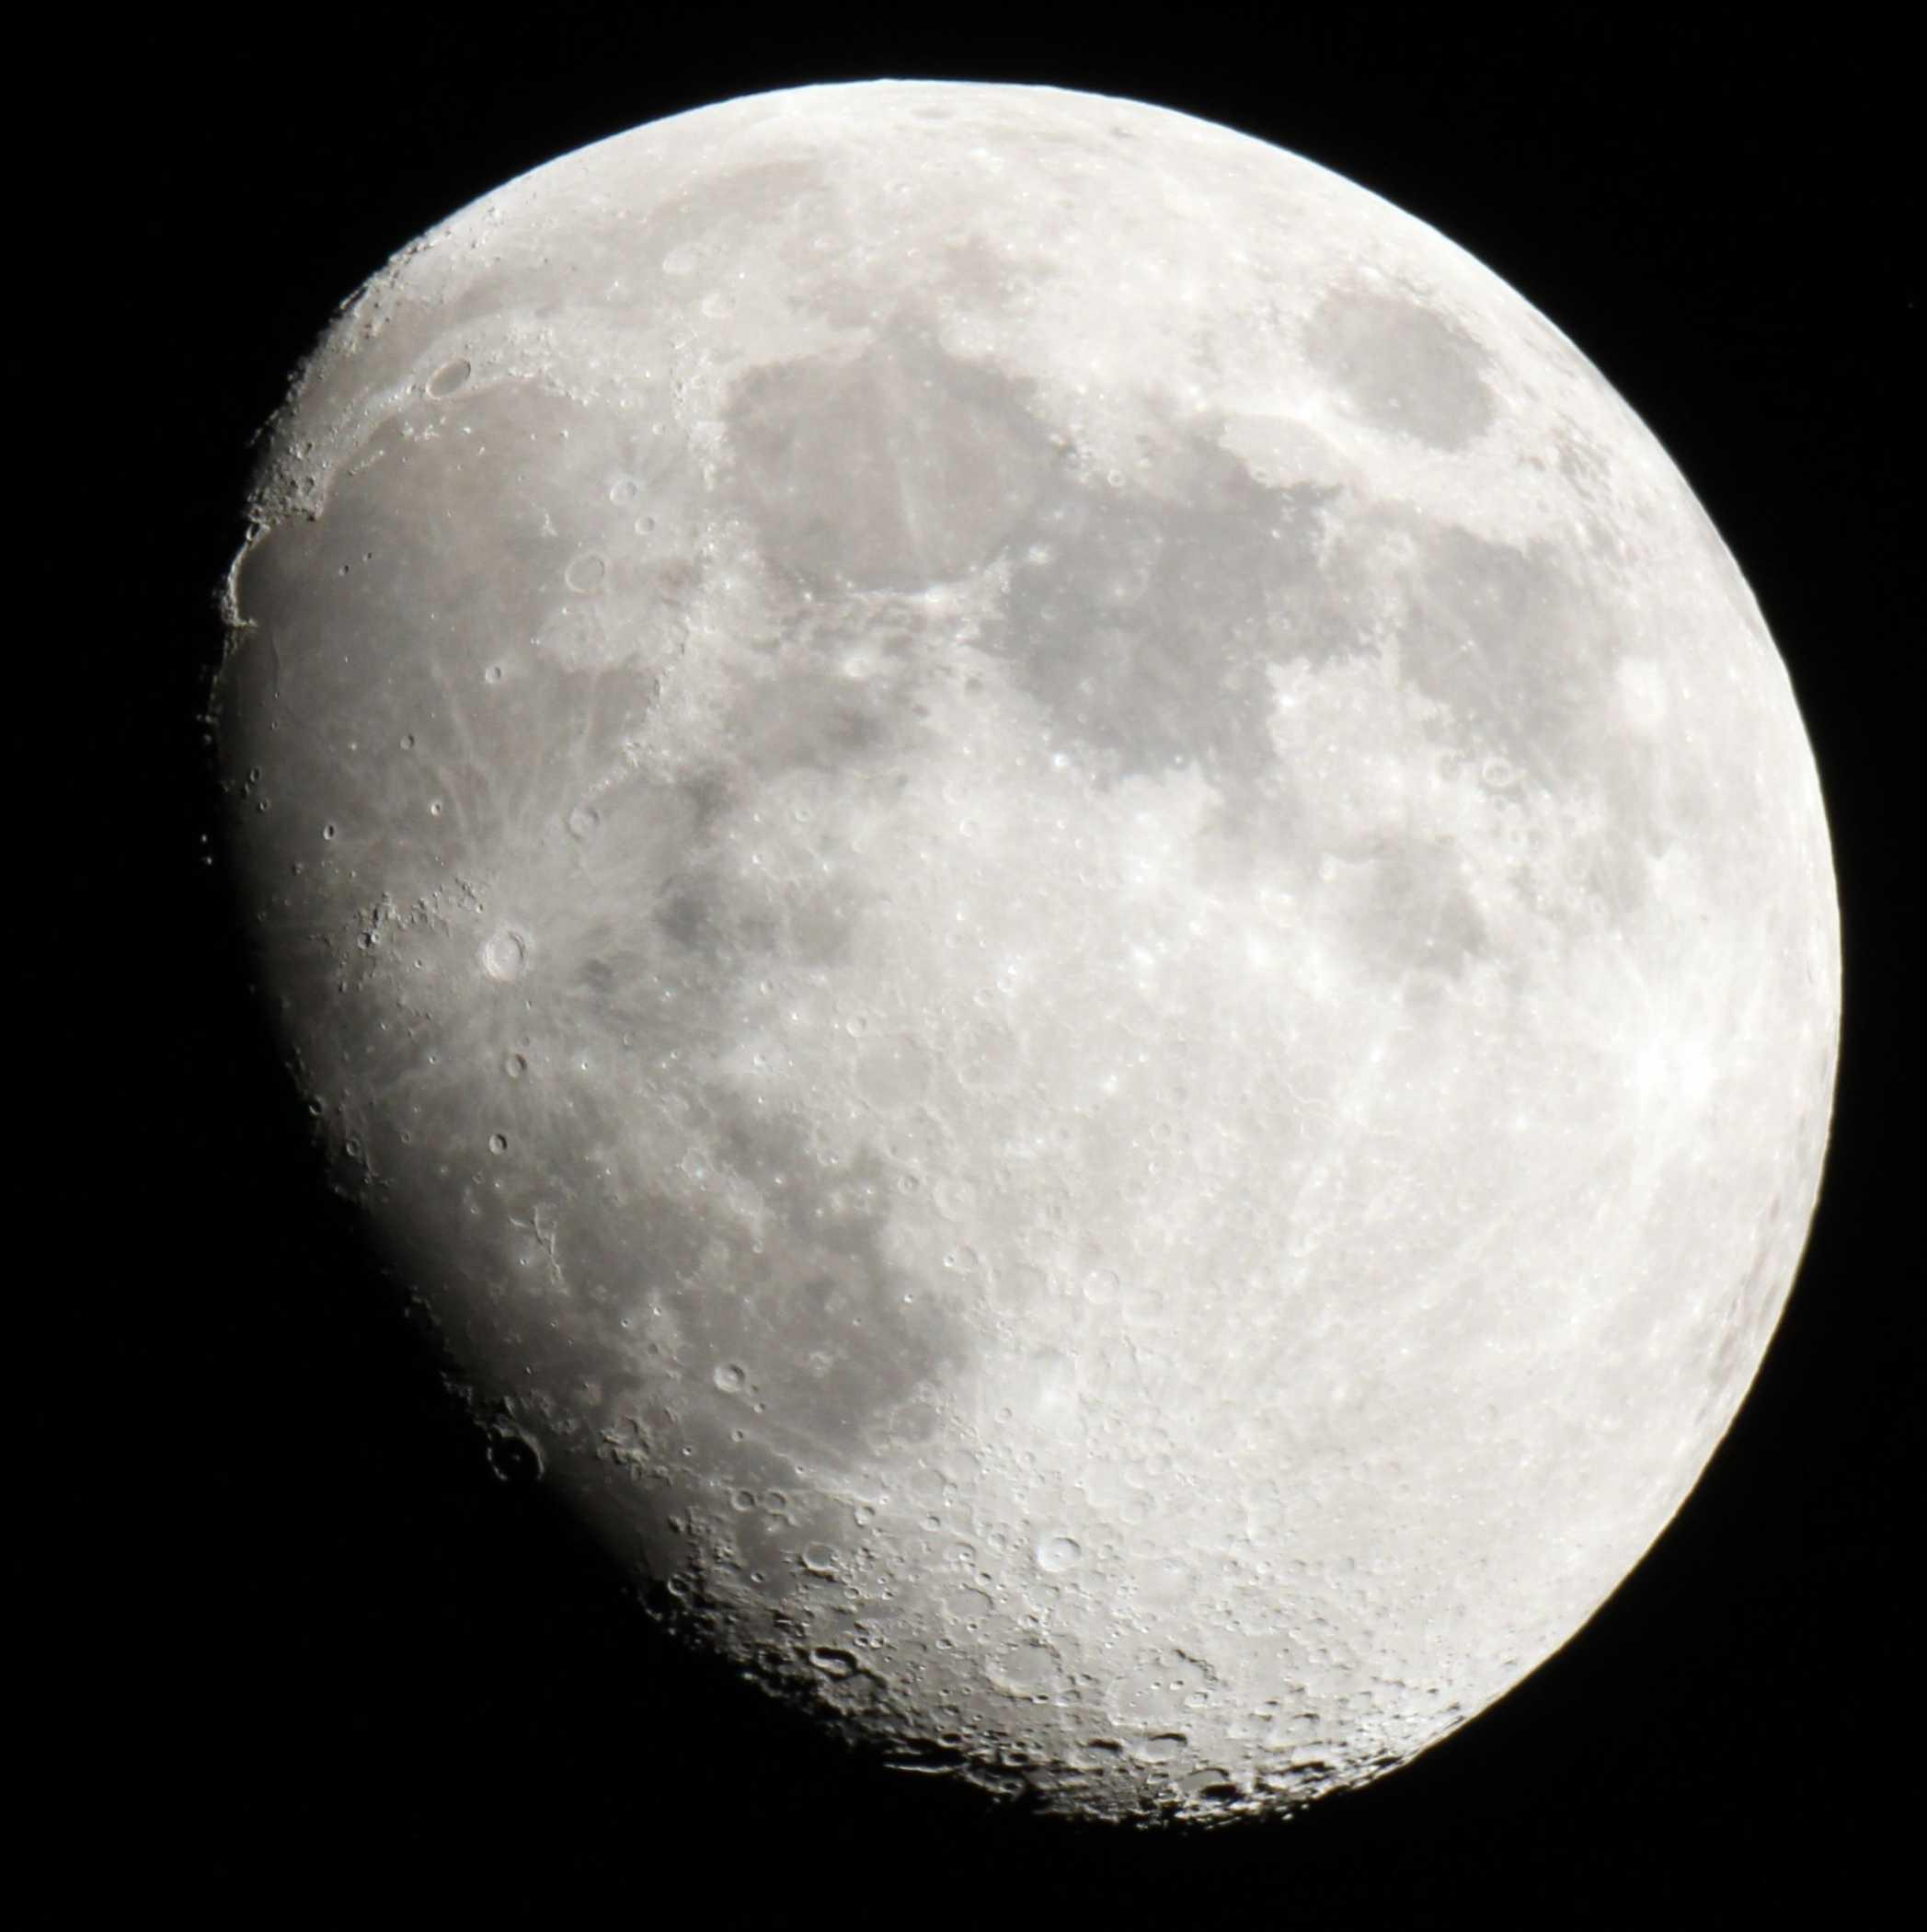 Mond_am_04.07.2014_ISO400_1/60s_EOS600D_MTO_1000/100.jpg